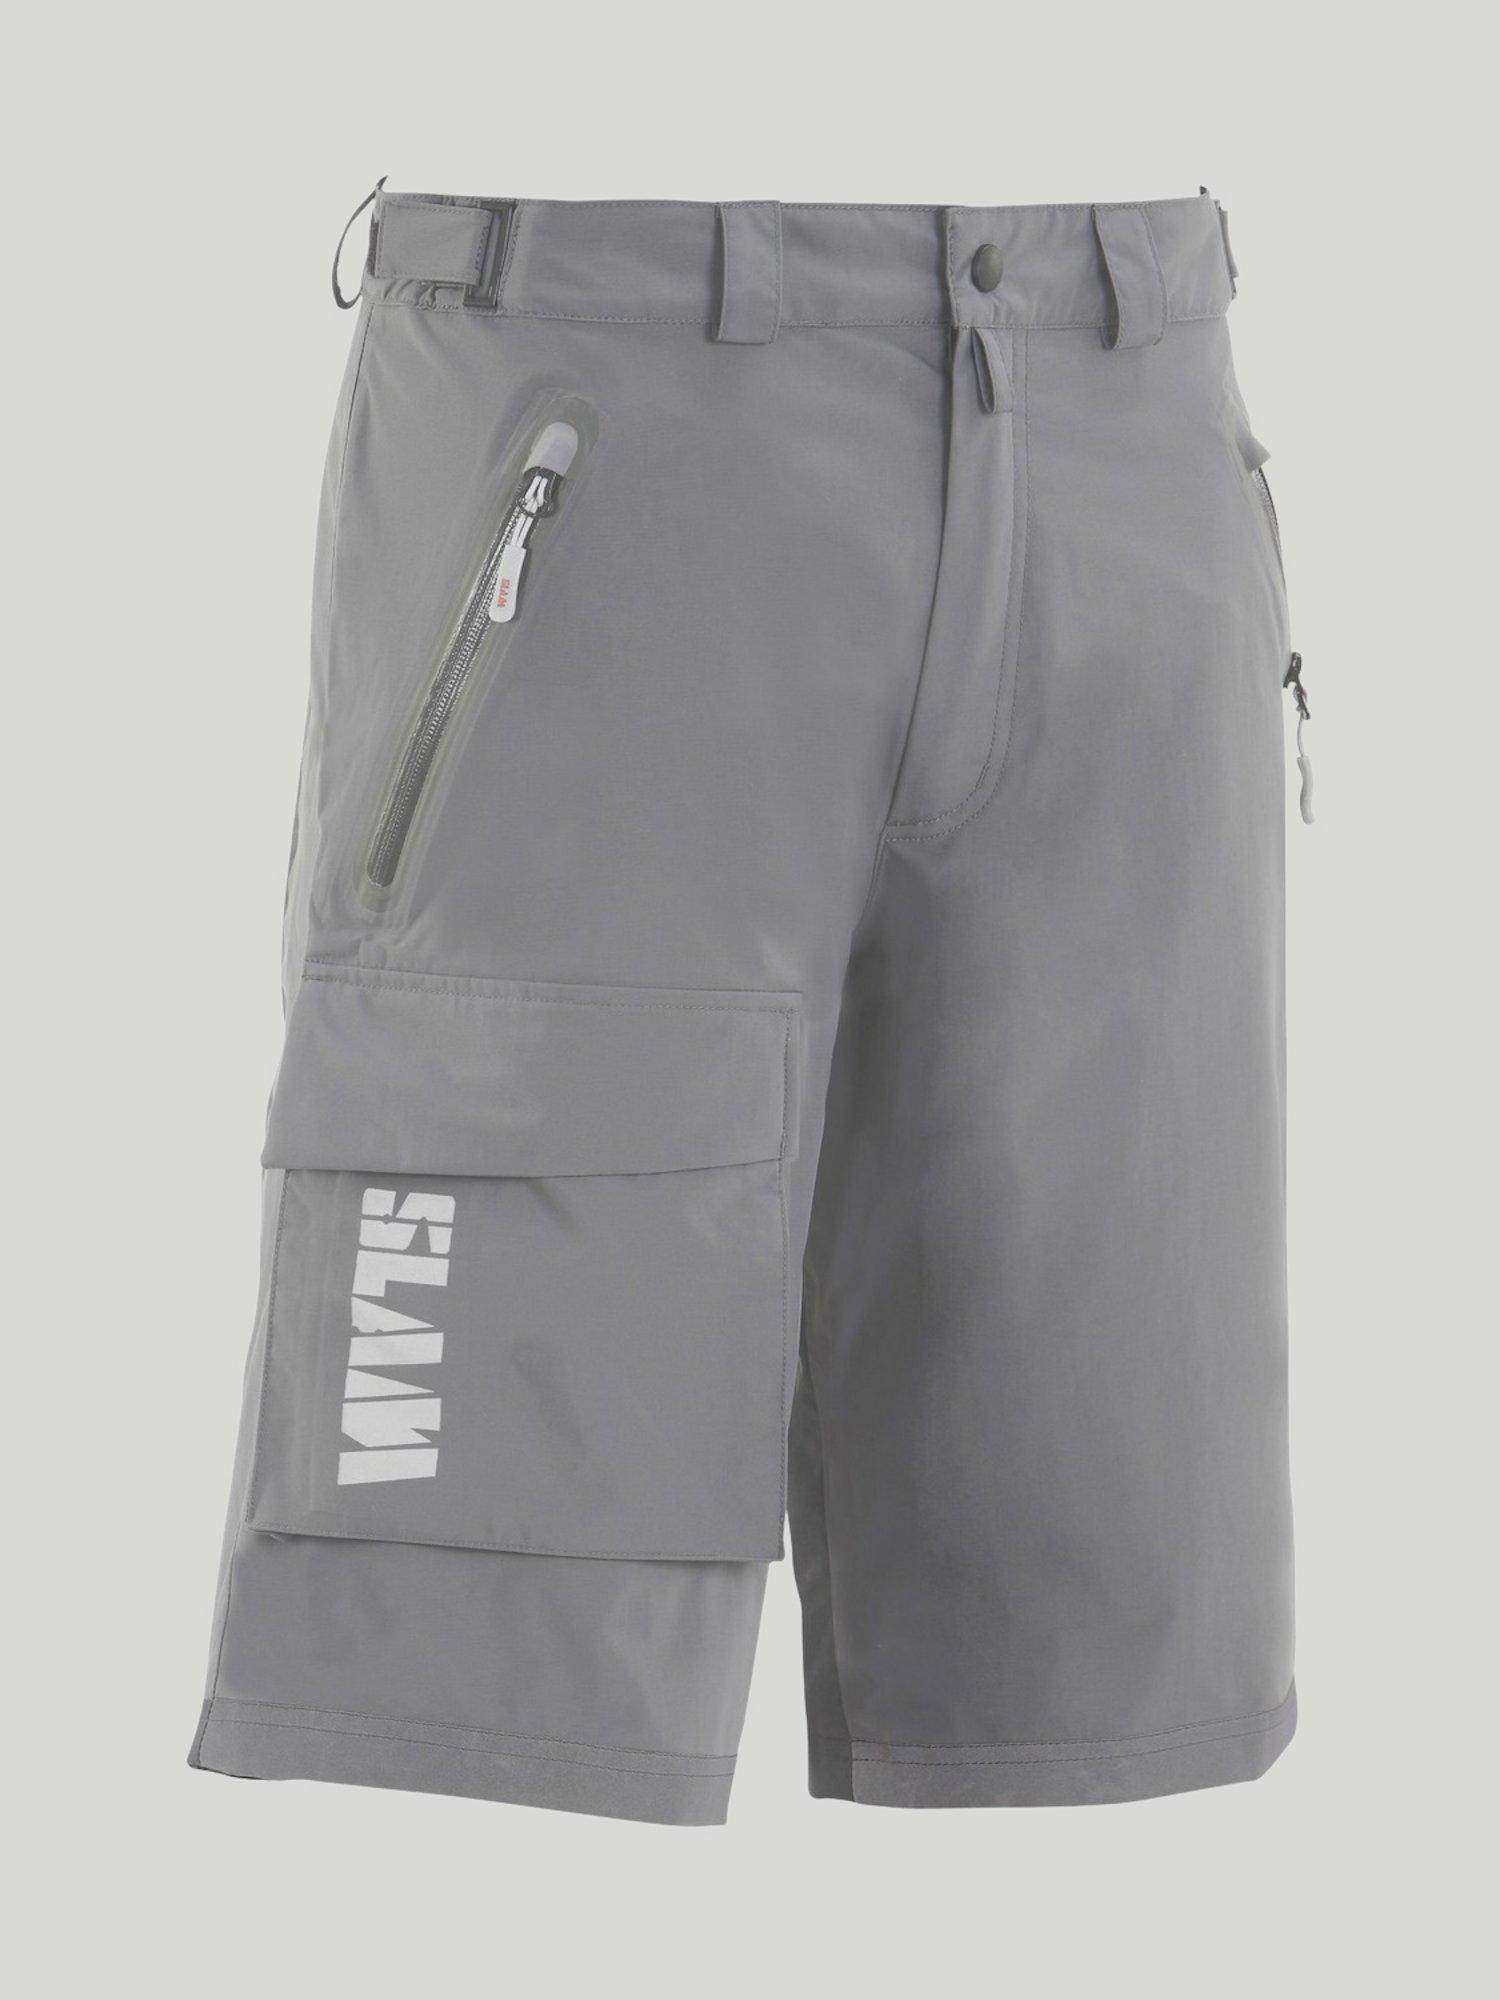 Pantaloncini Force 2 - Grigio